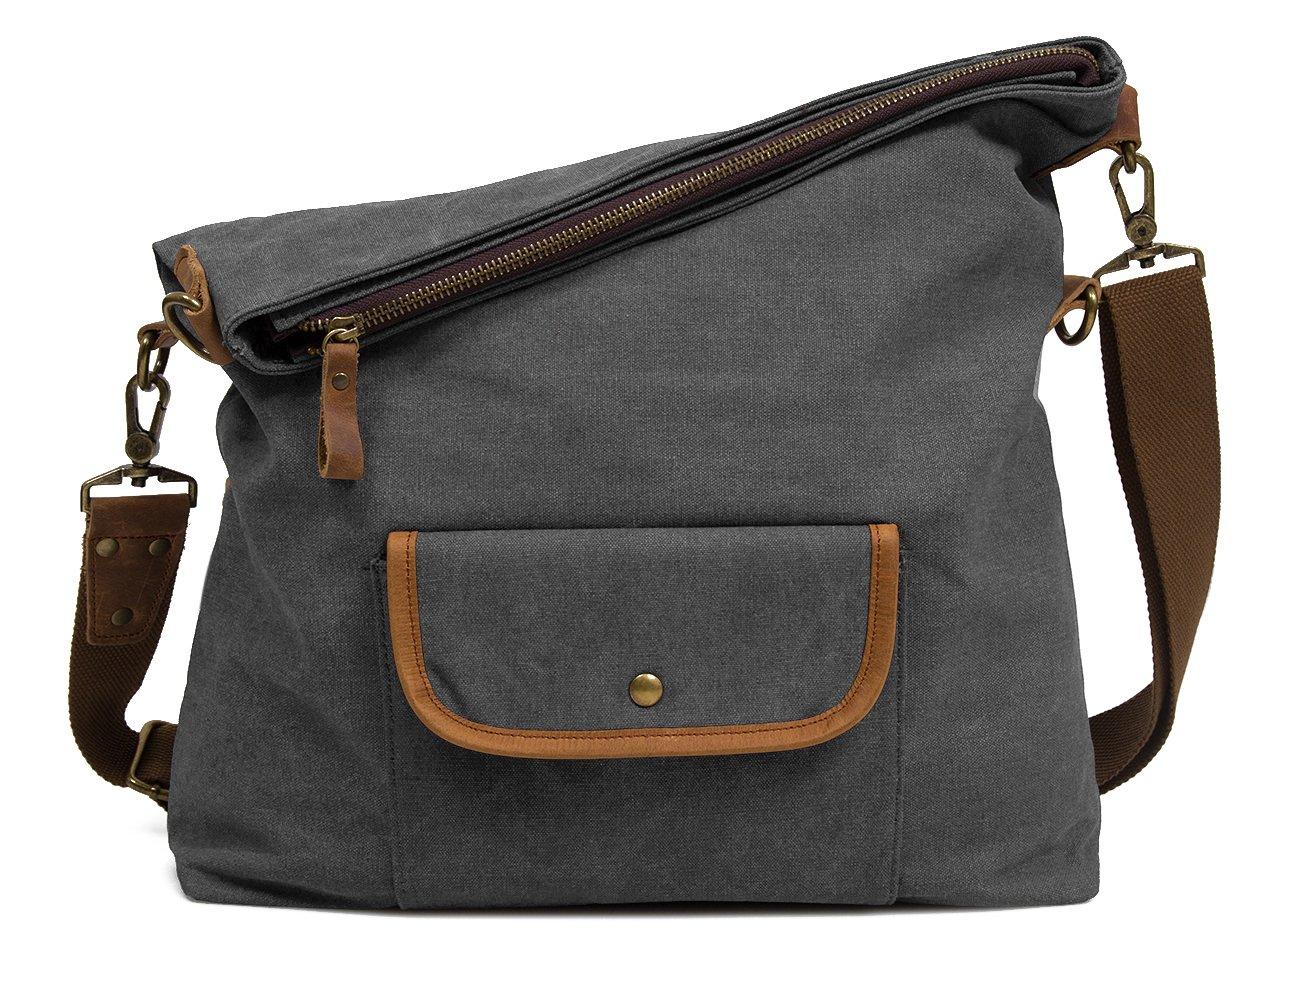 ECOSUSI Canvas Hobo Bag Crossbody School Messenger Shoulder Bags for Men and Women, Gray Ecou025017008